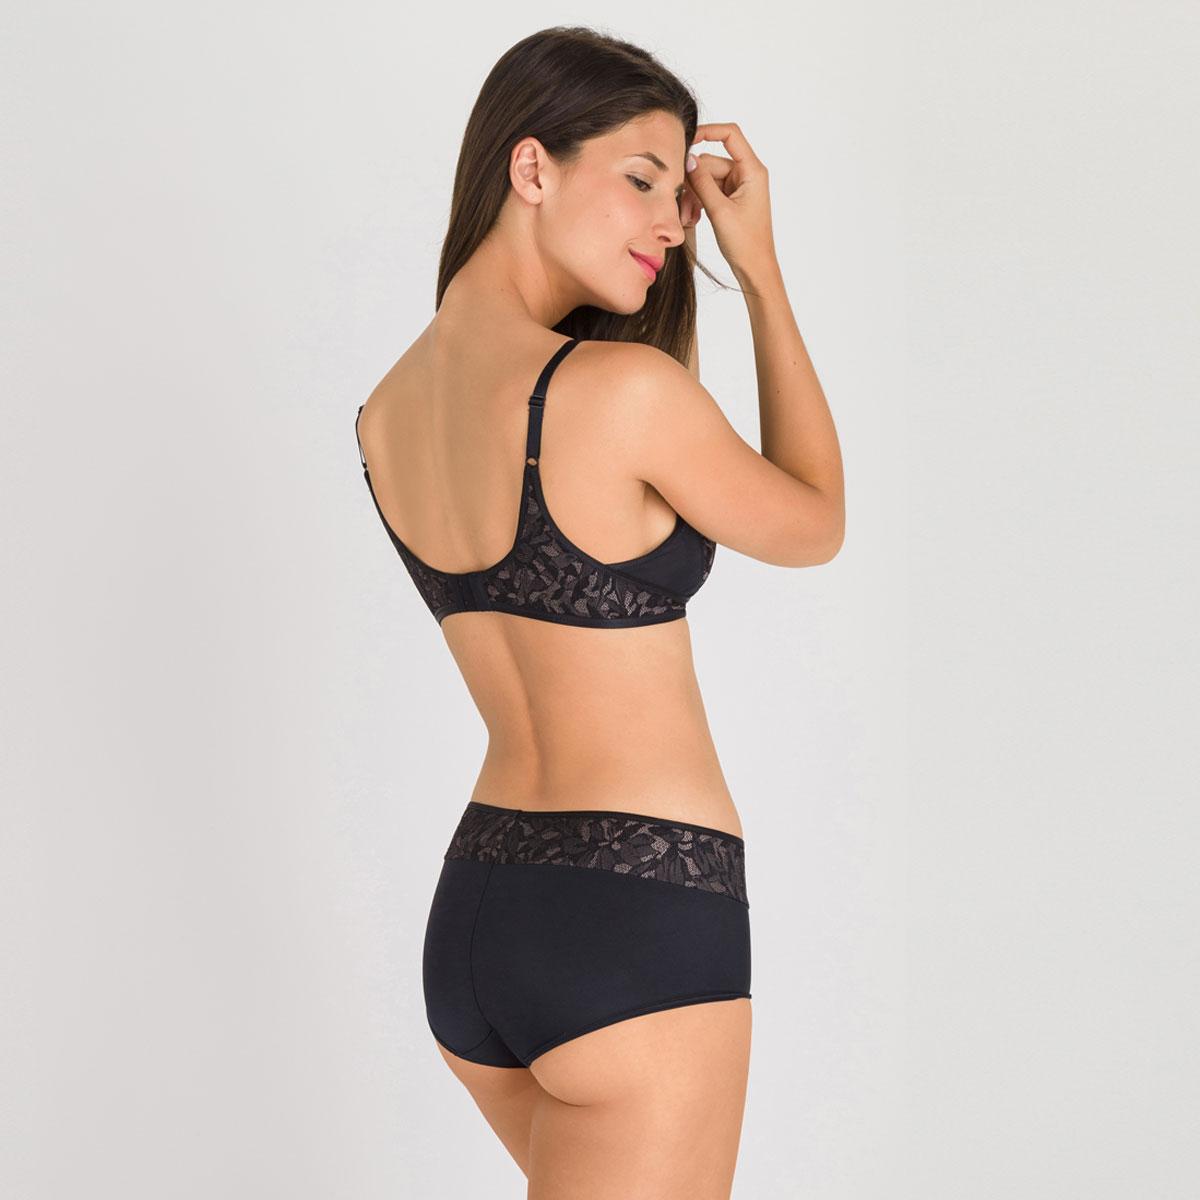 Braga negro gris - Ideal Beauty Lace, , PLAYTEX